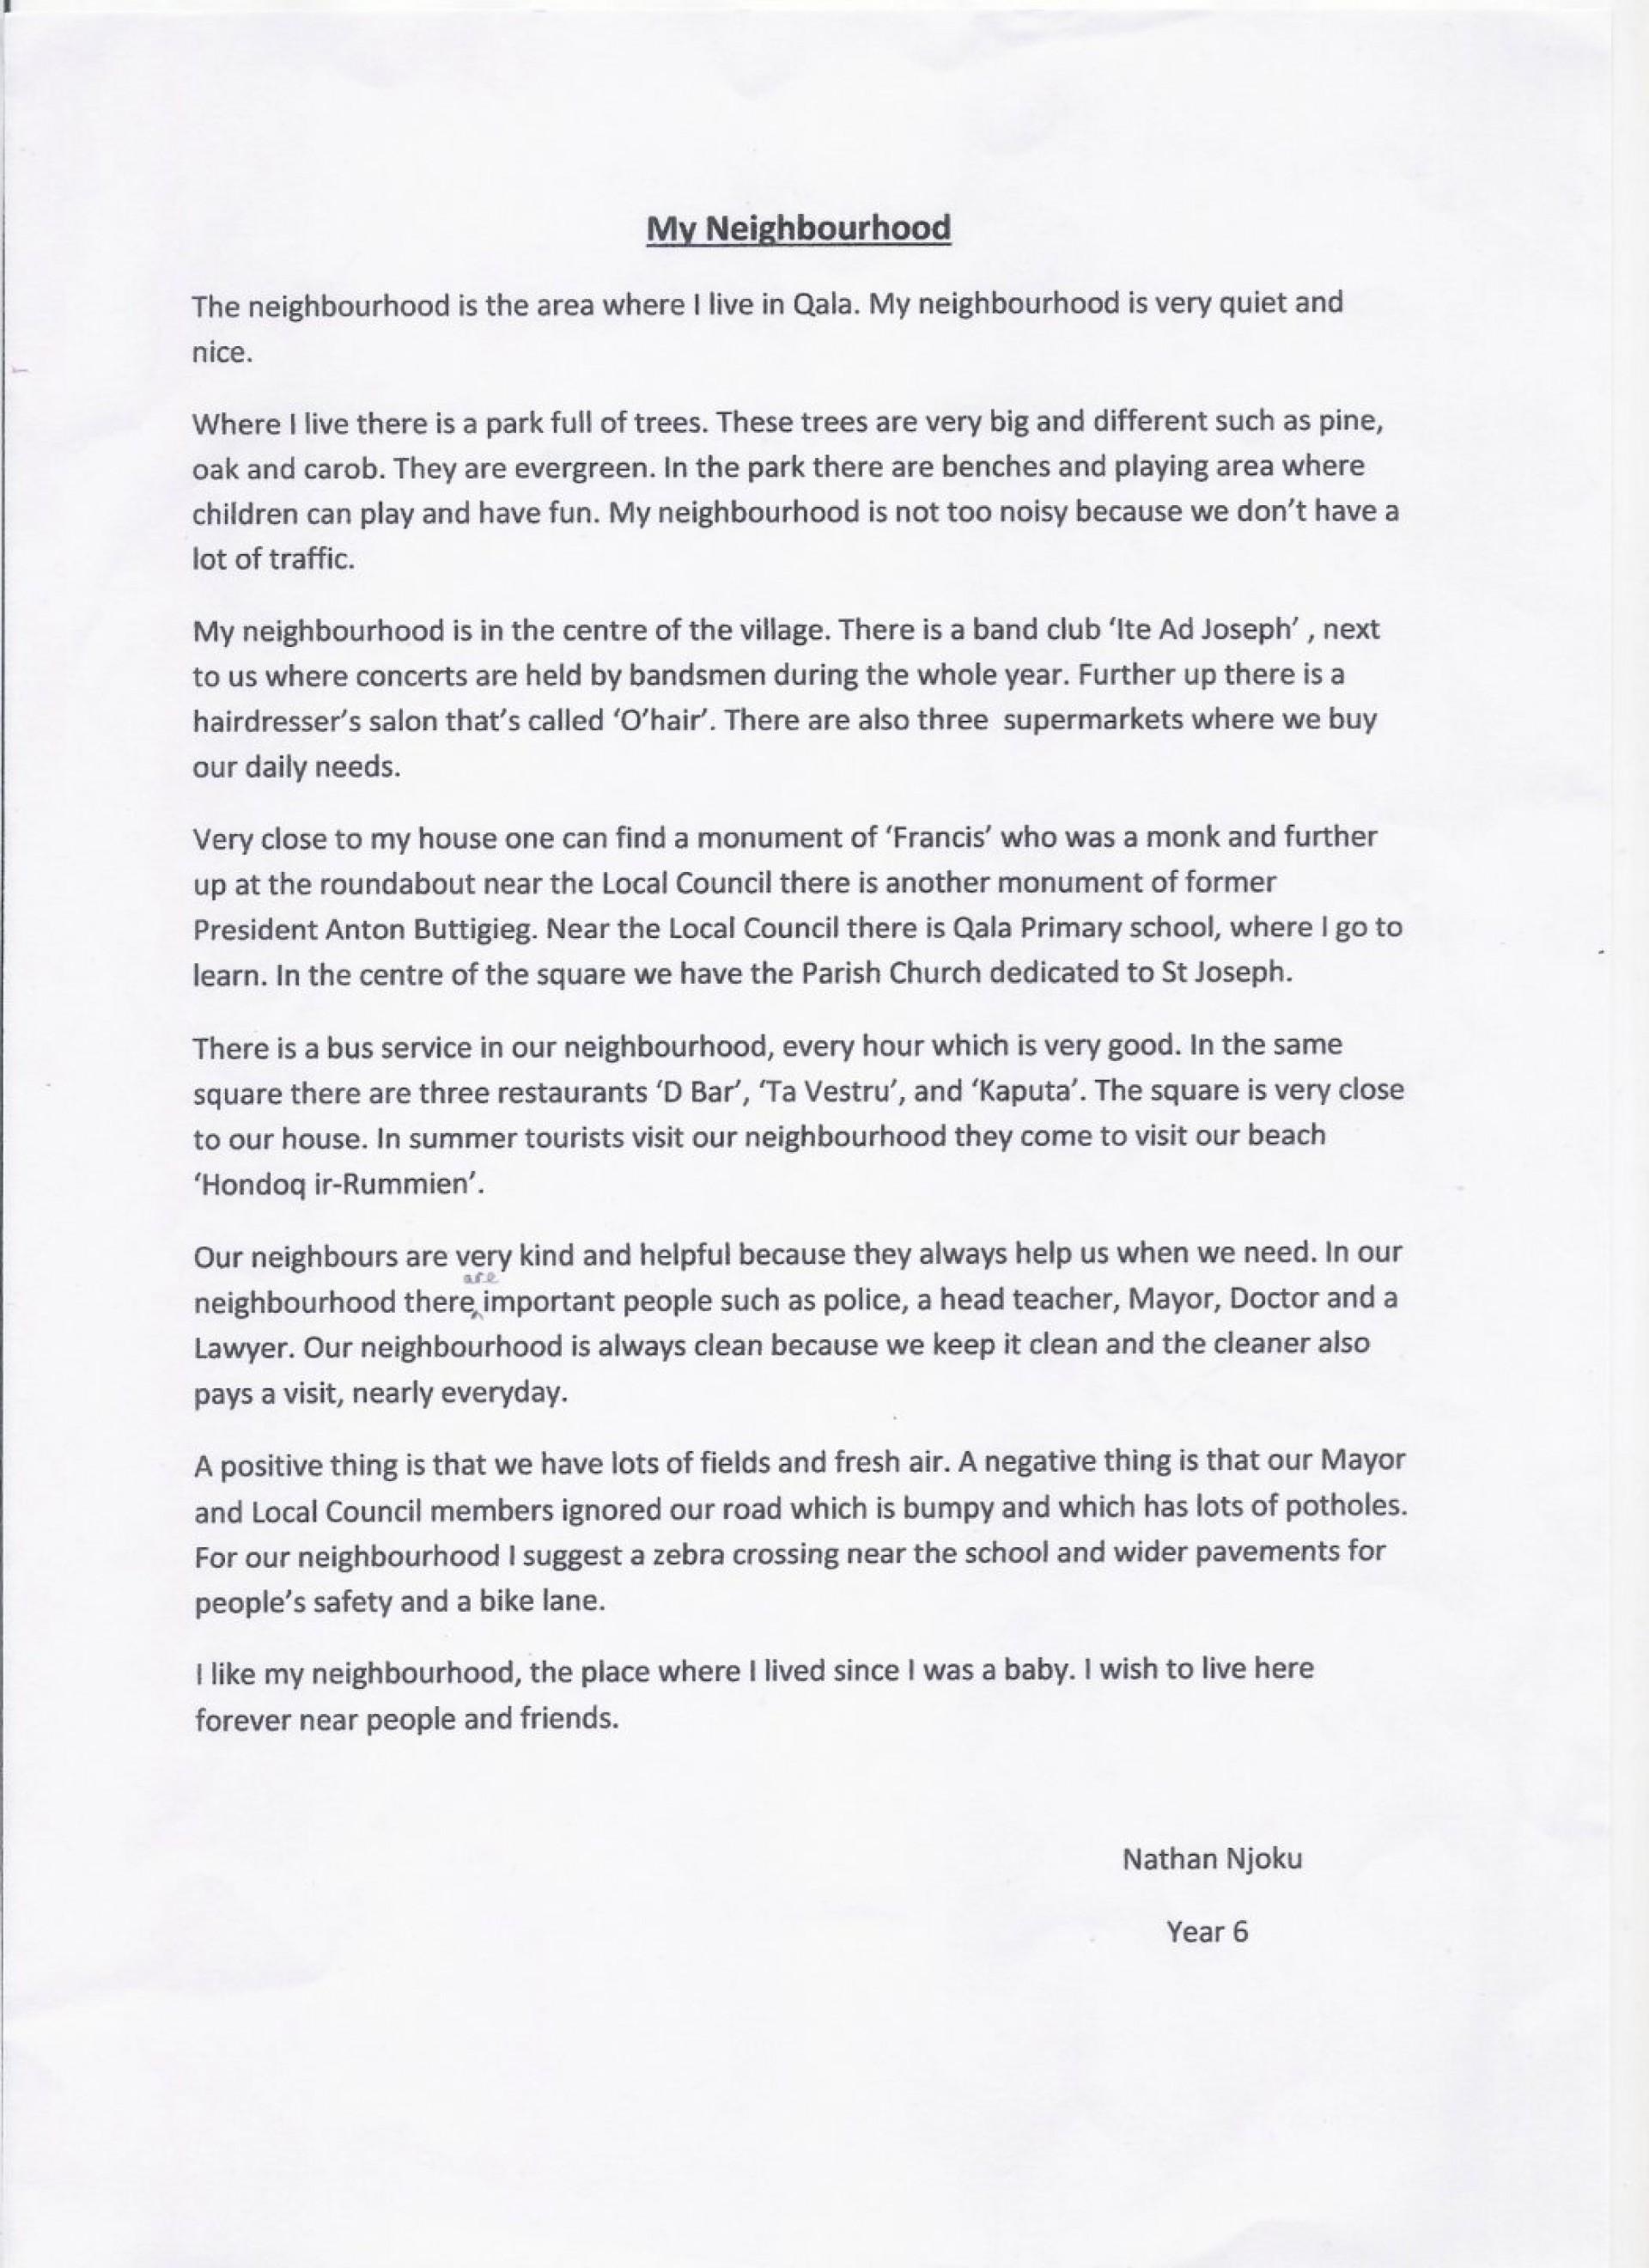 school essay on my neighbourhood